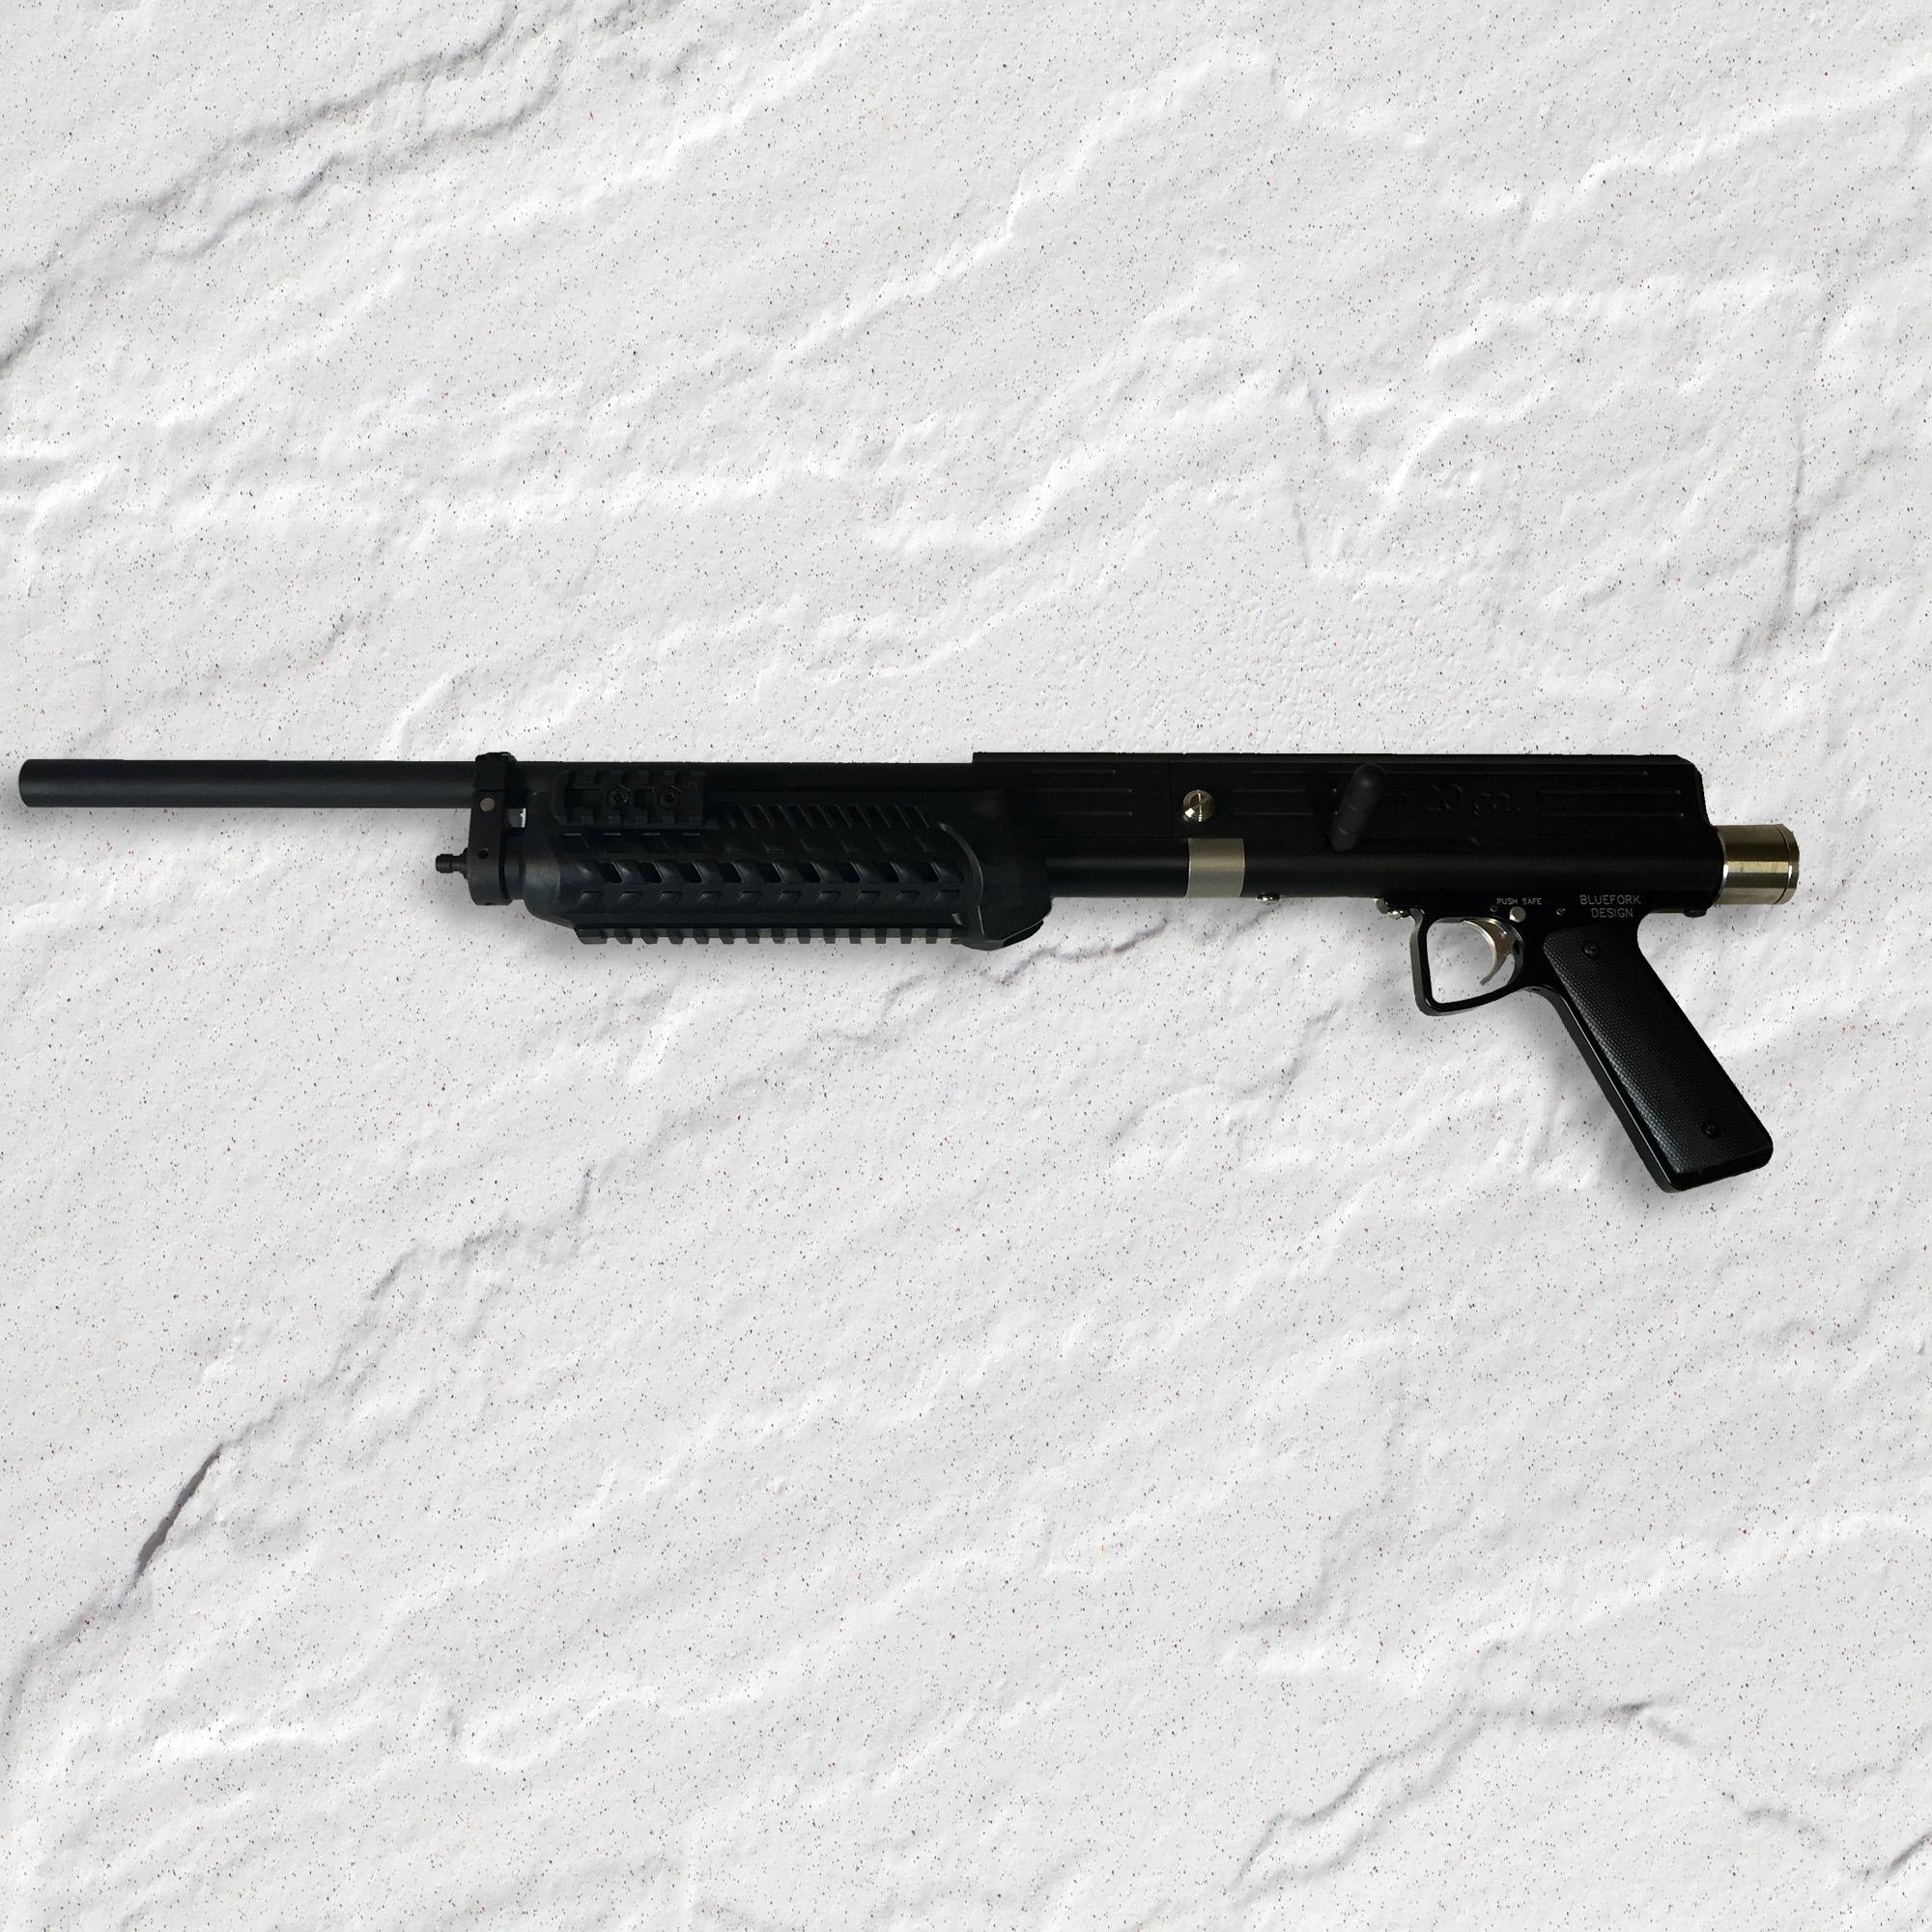 Pro Ar 20 Gauge Shotgun Pistol Hunting Big Bore Air Guns